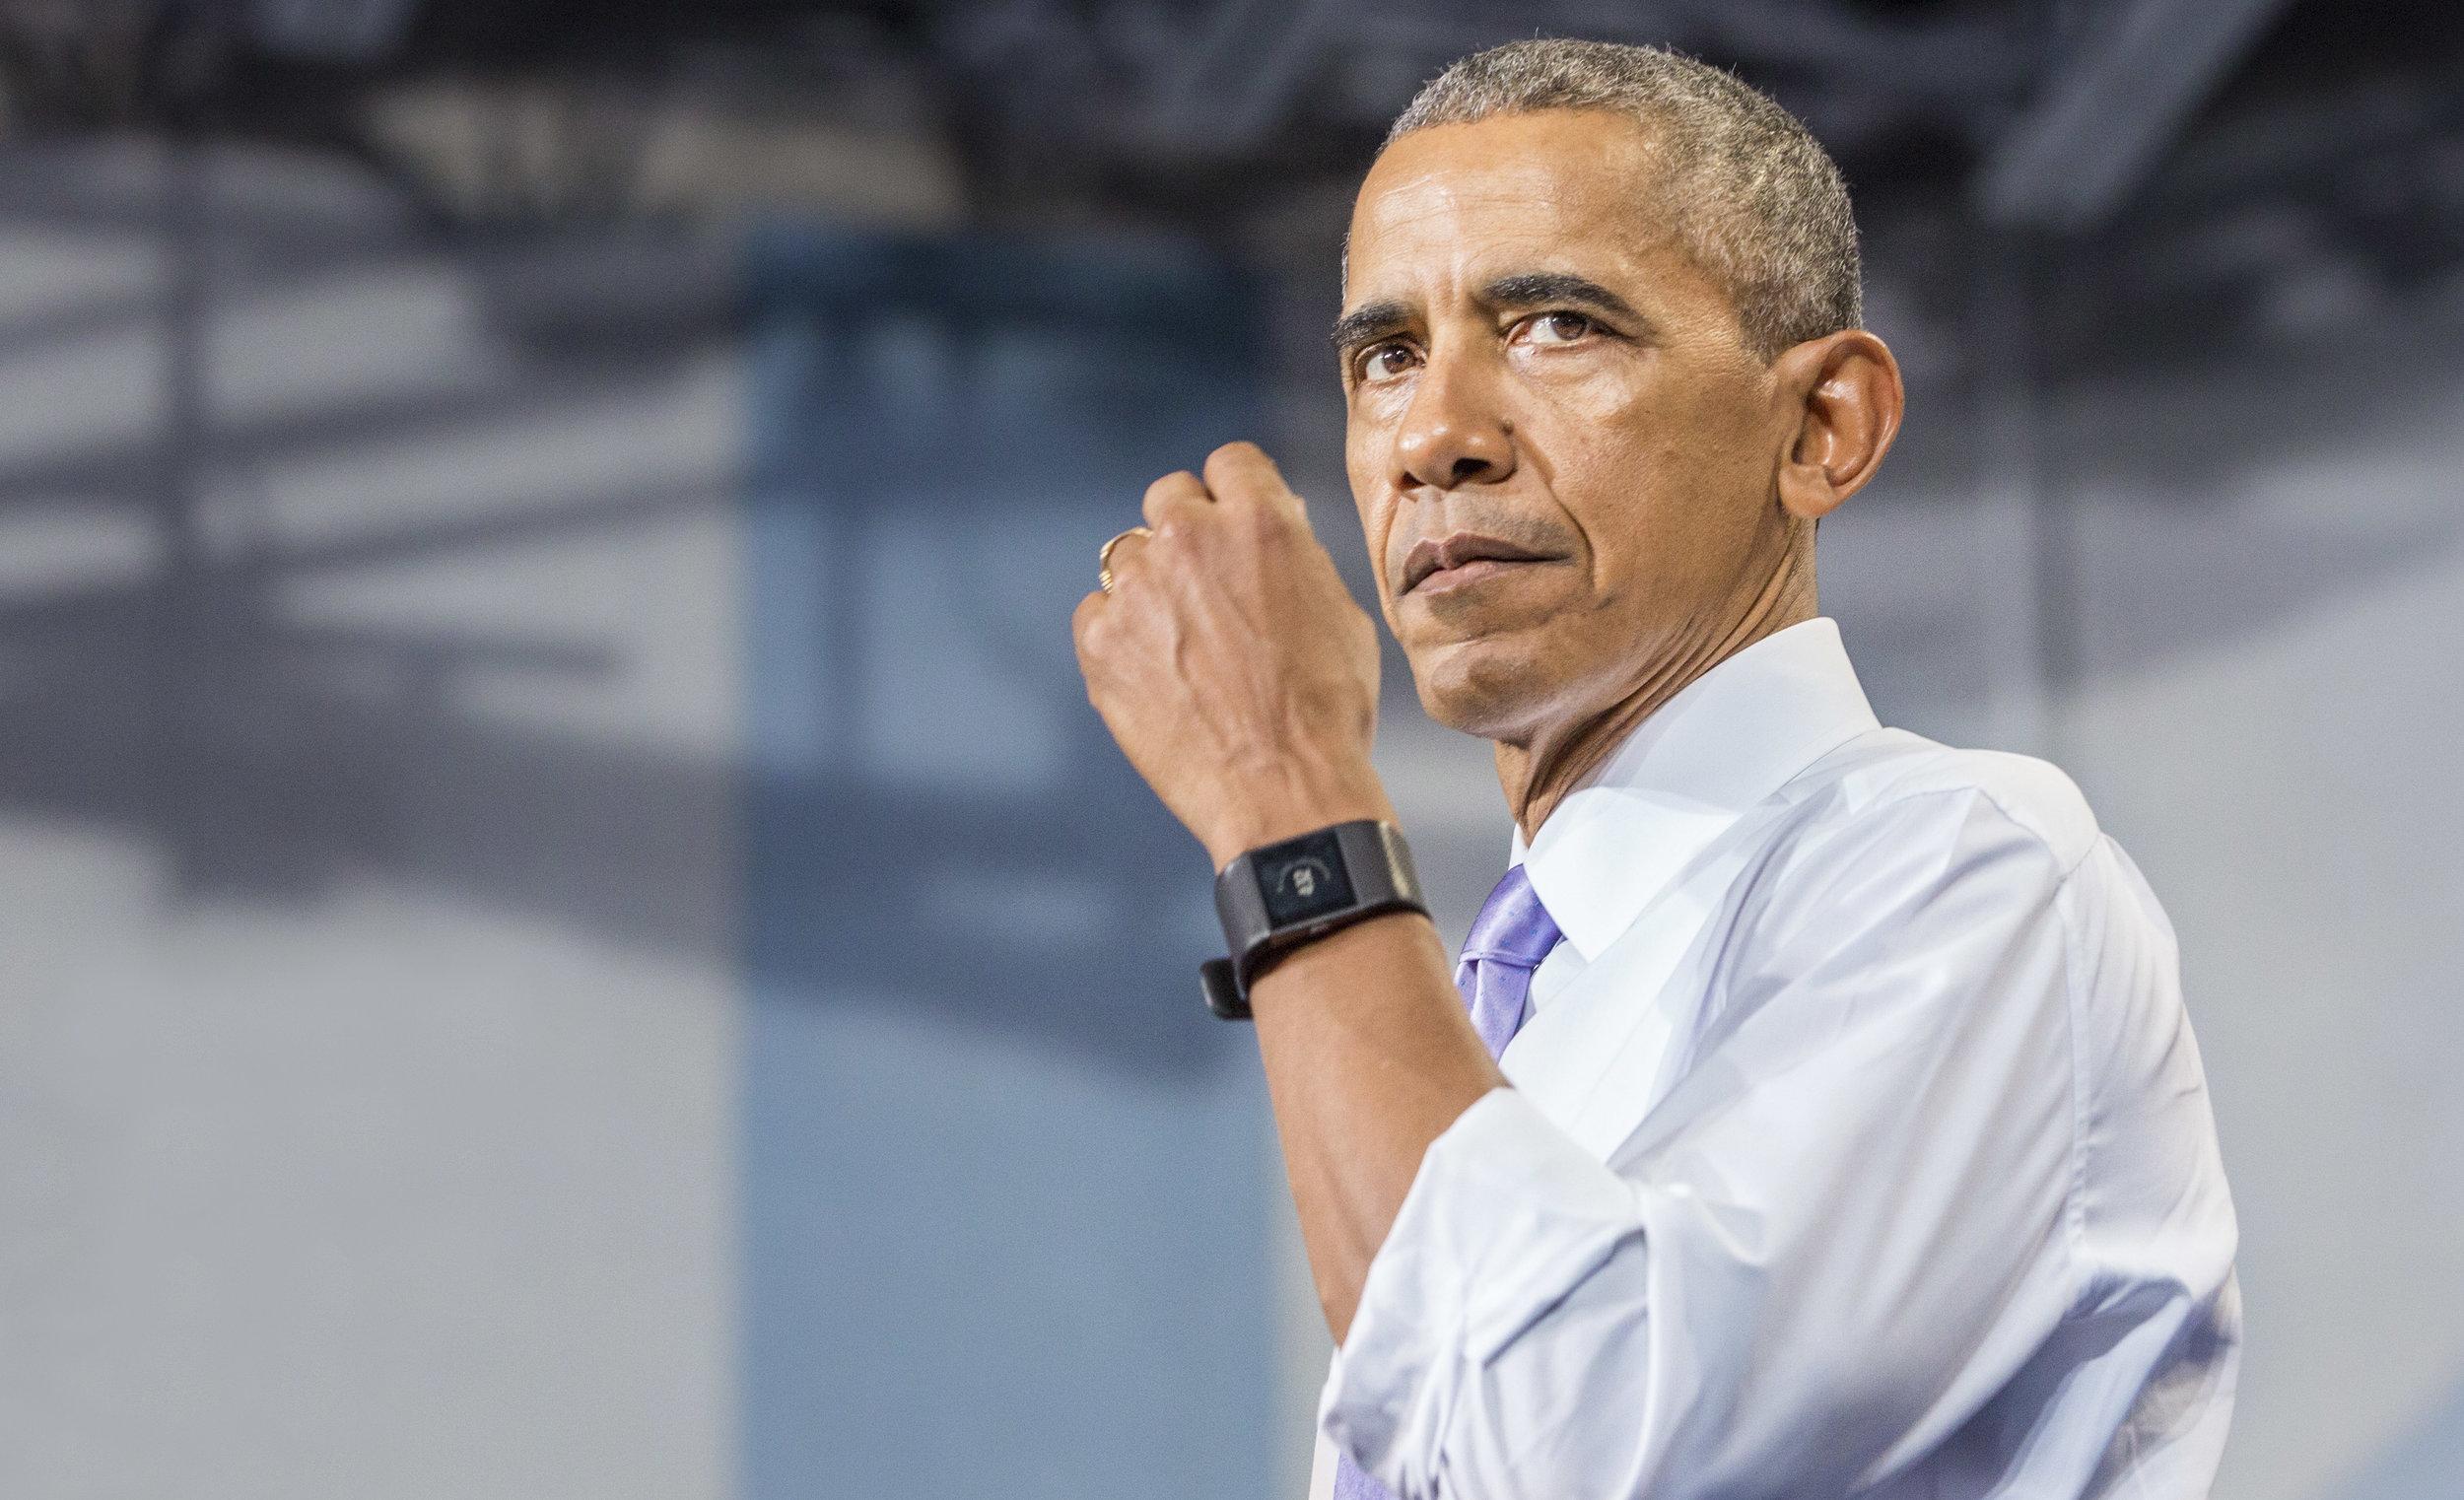 10202016_BJM_Barack_Obama_Campaigns_in_Miami_Florida_04.jpg